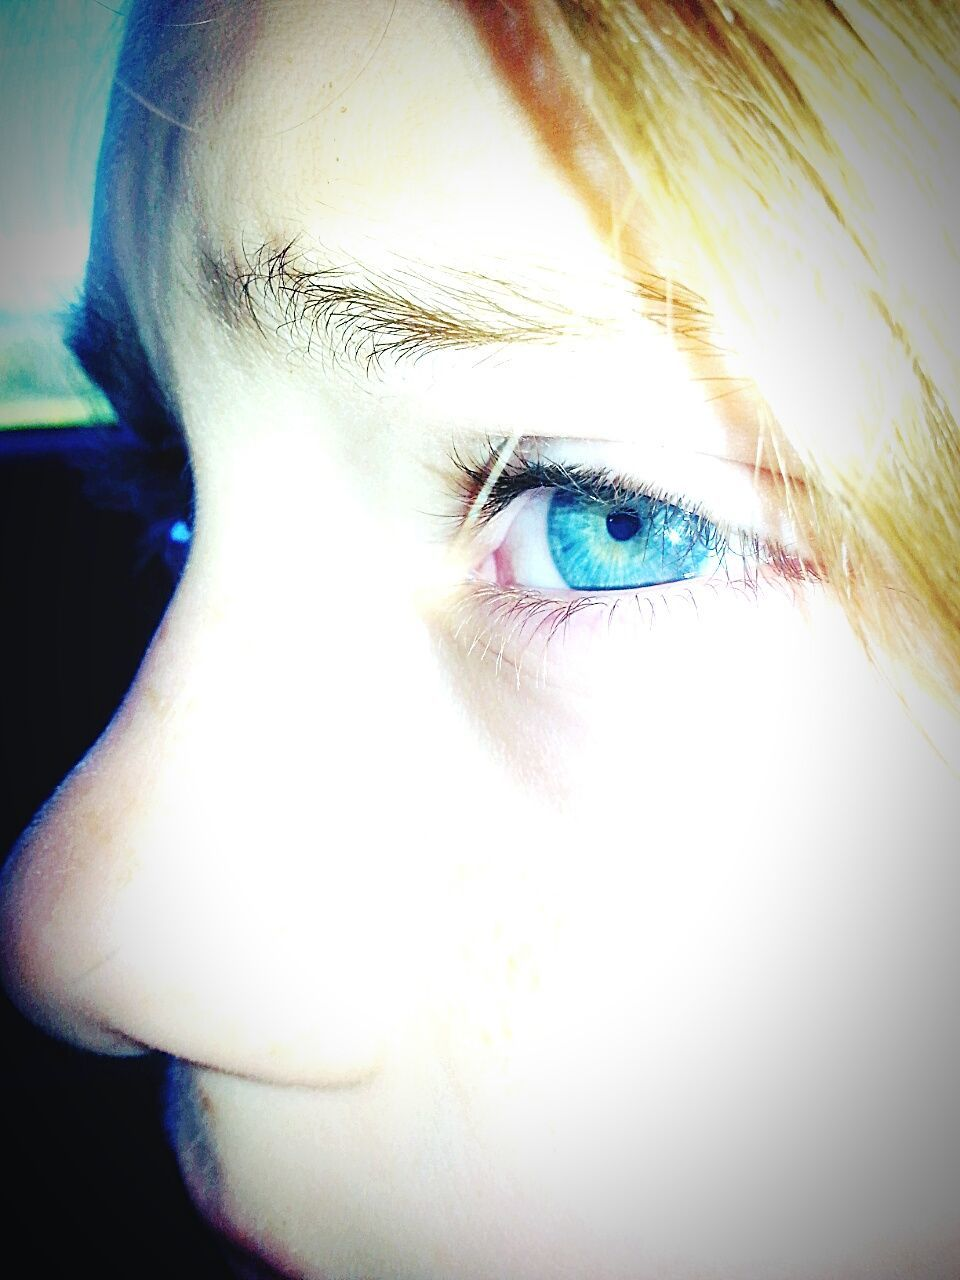 human eye, one person, real people, close-up, human body part, human face, looking at camera, portrait, indoors, eyelash, childhood, eyeball, sensory perception, eyesight, eyebrow, day, people